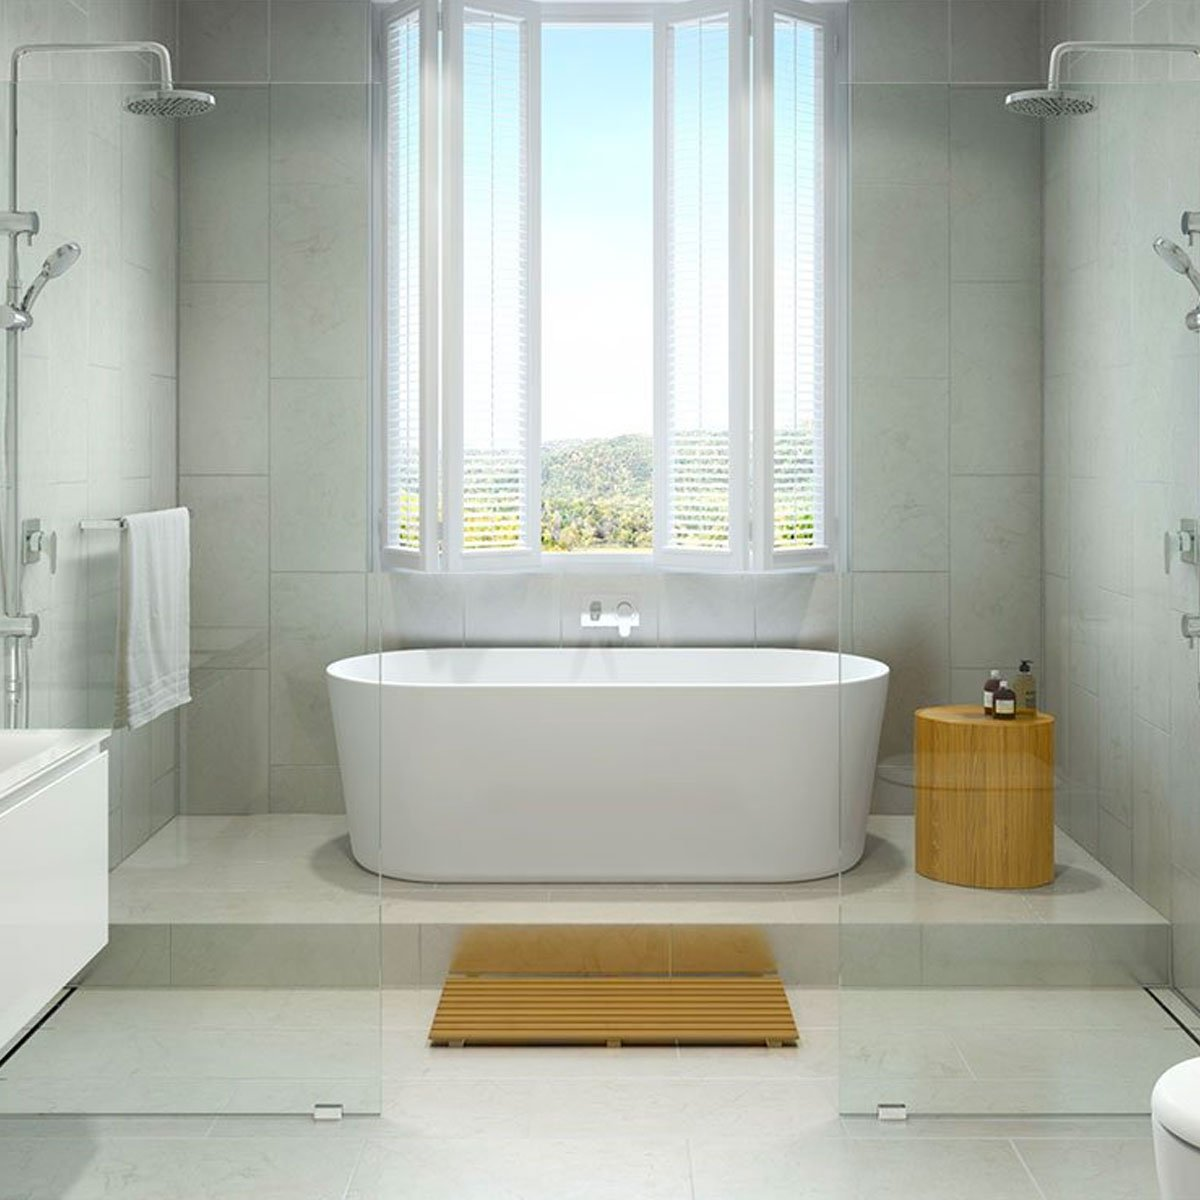 A2zBuilders Bedford Loft conversion bathroom